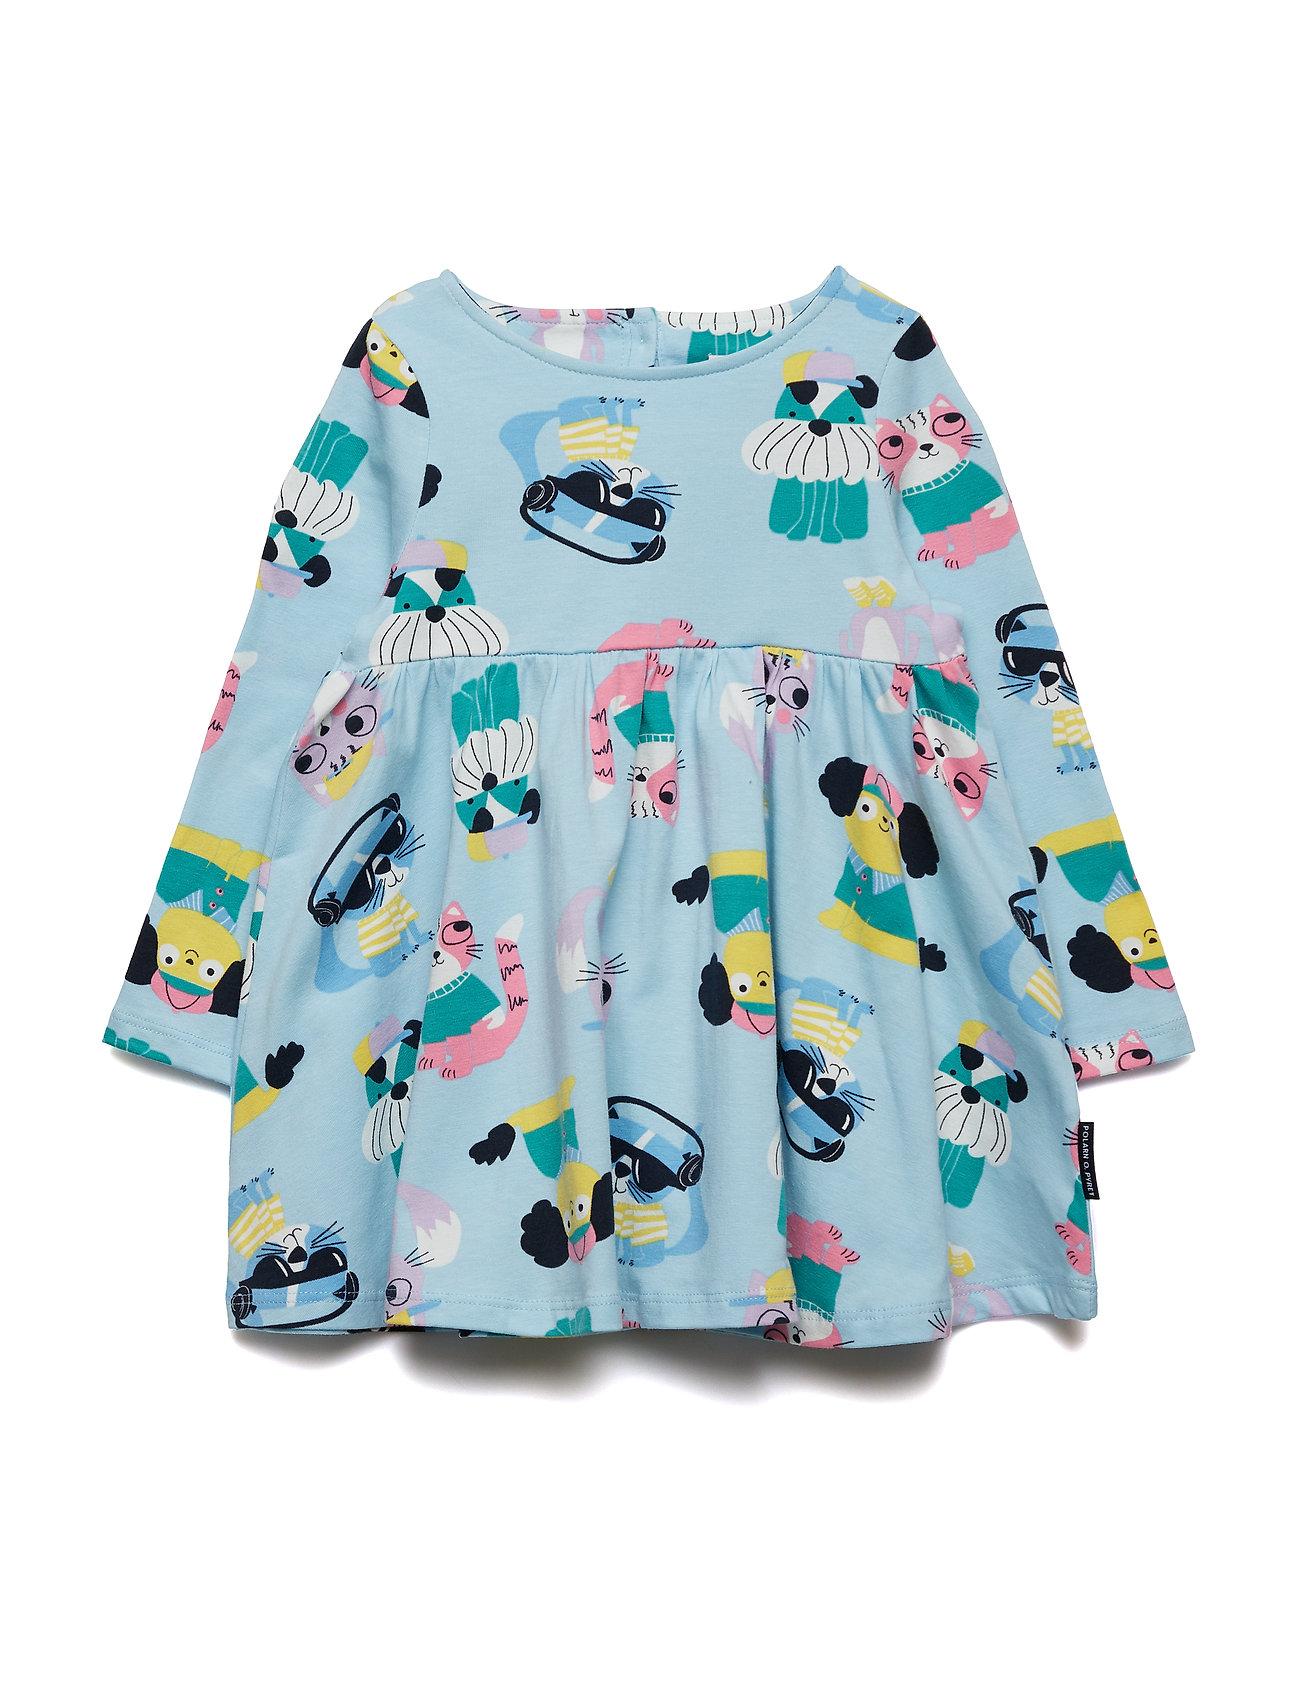 Polarn O. Pyret Dress Jersey Preschool